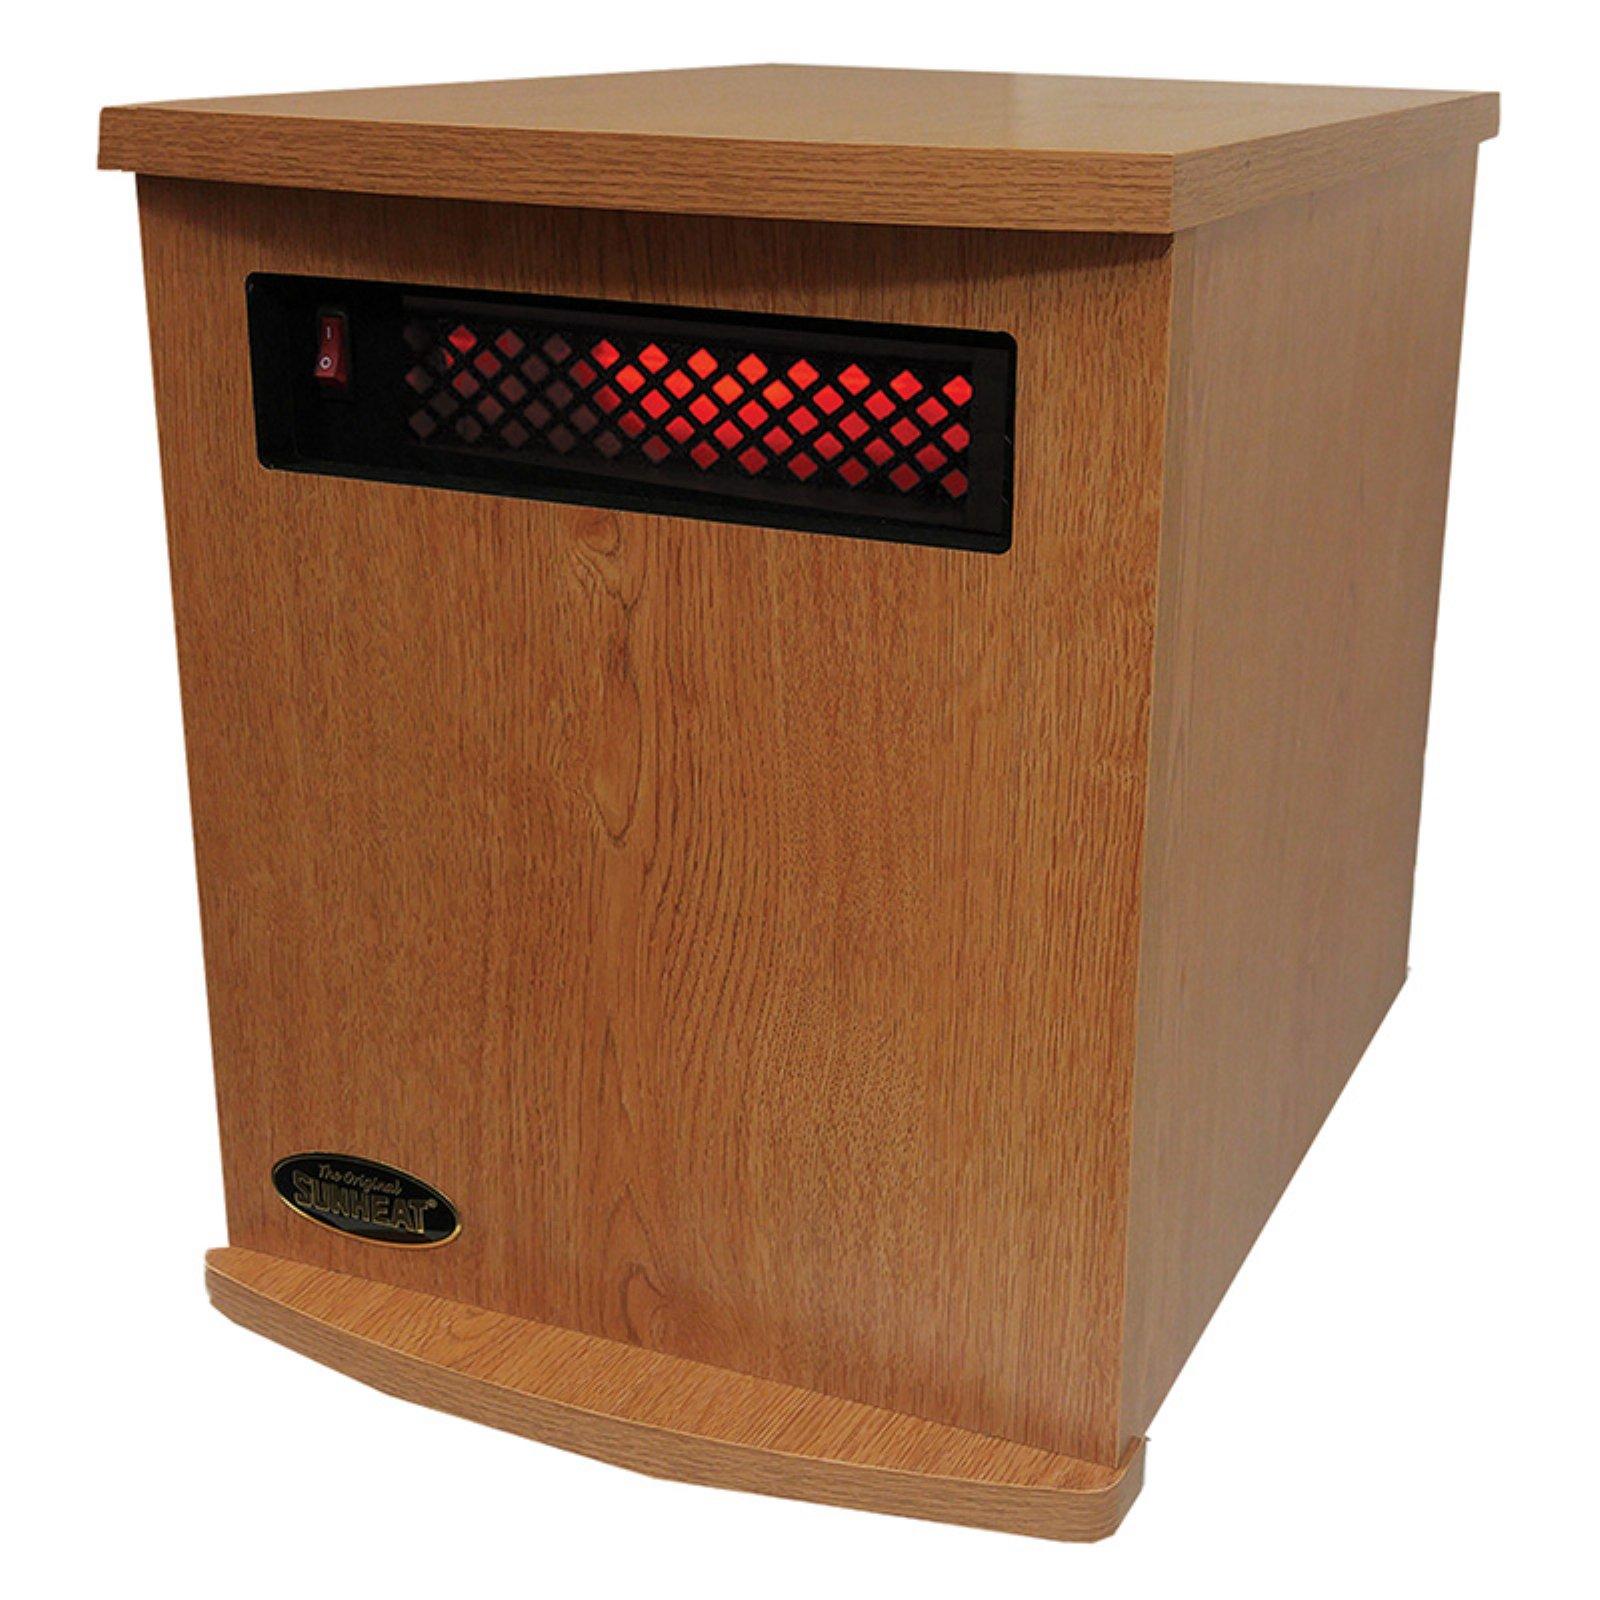 SUNHEAT USA1500 Original Infrared Heater